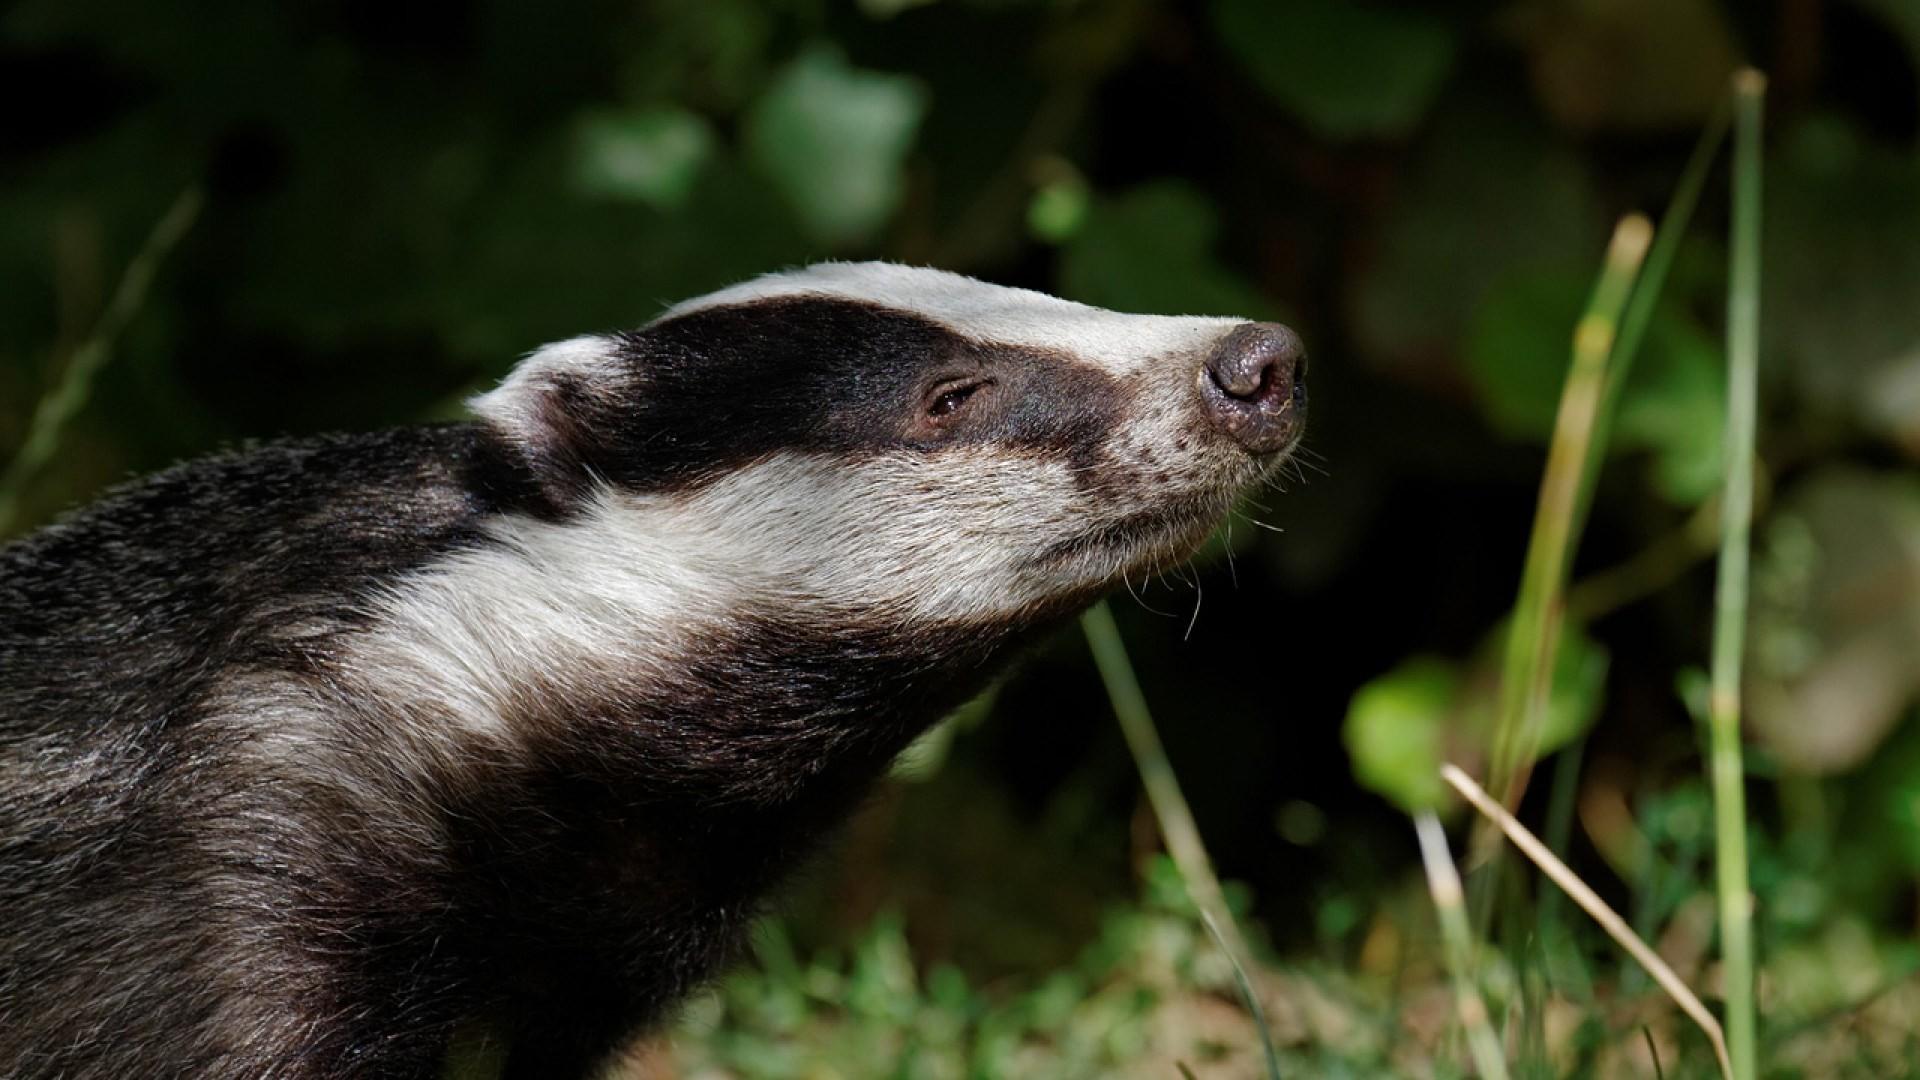 hd badger wallpaper